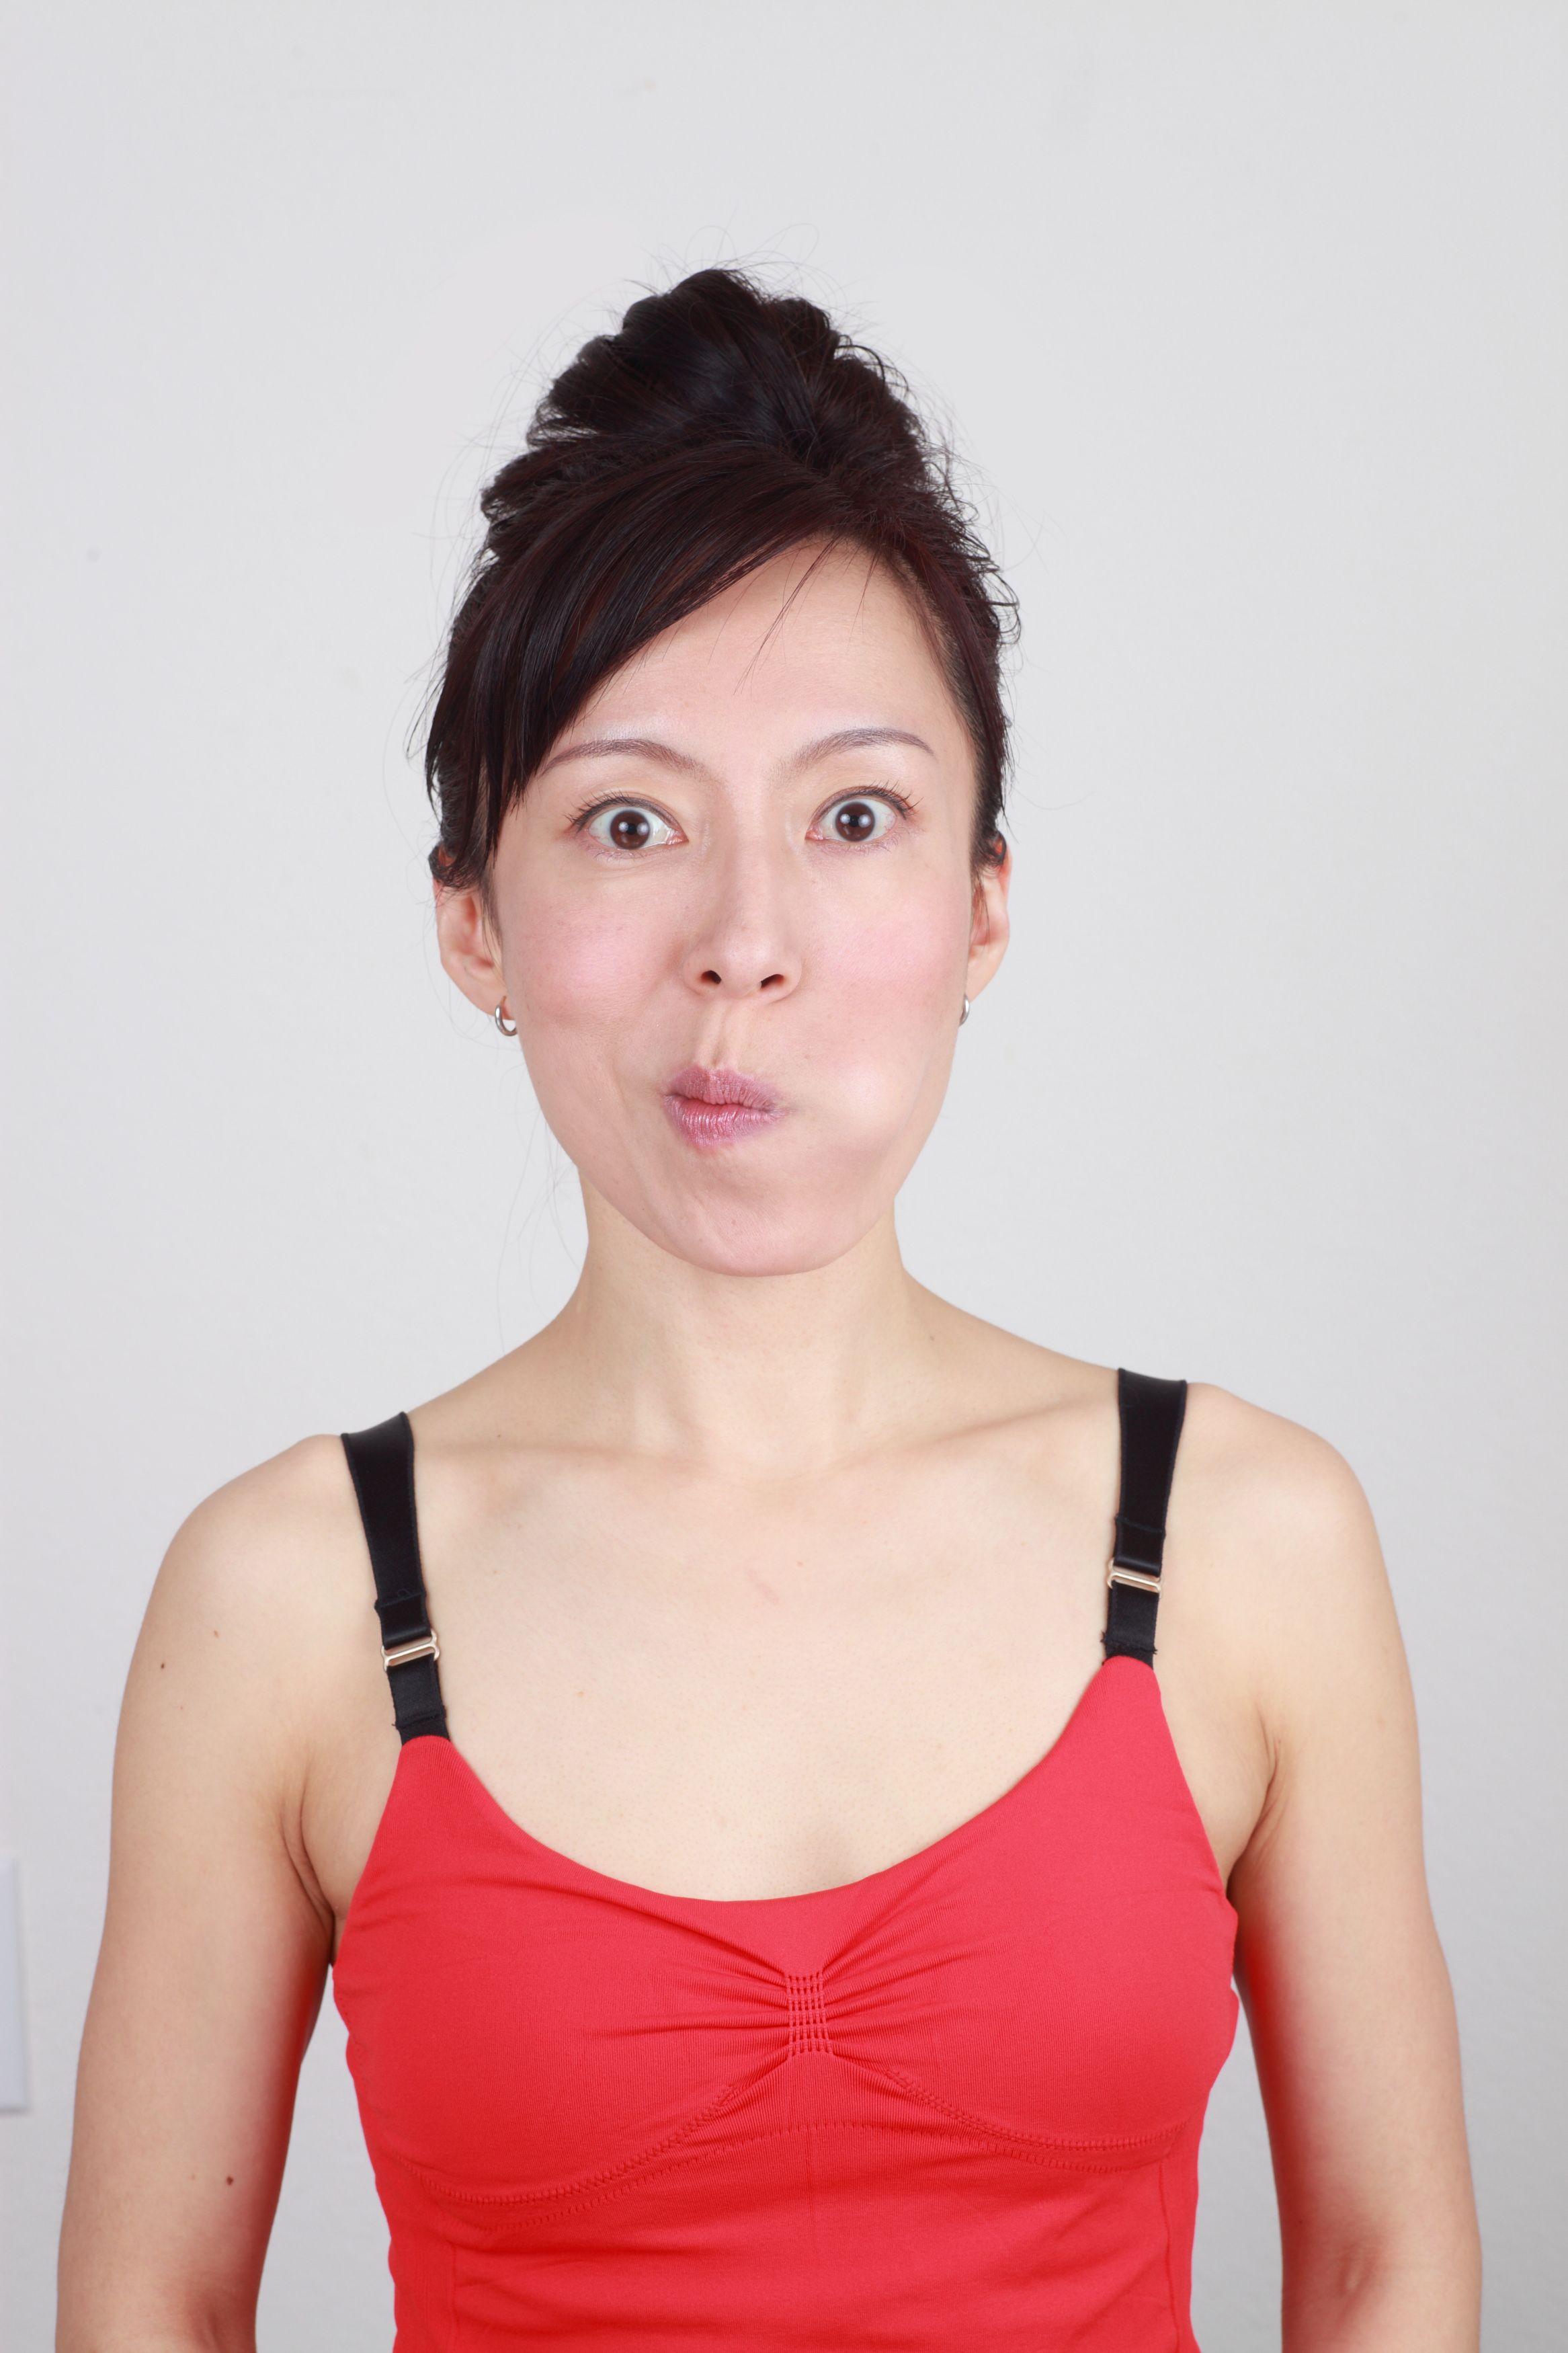 5 Benefits of Facial Yoga (Plus 2 Facial Yoga Poses to Try)